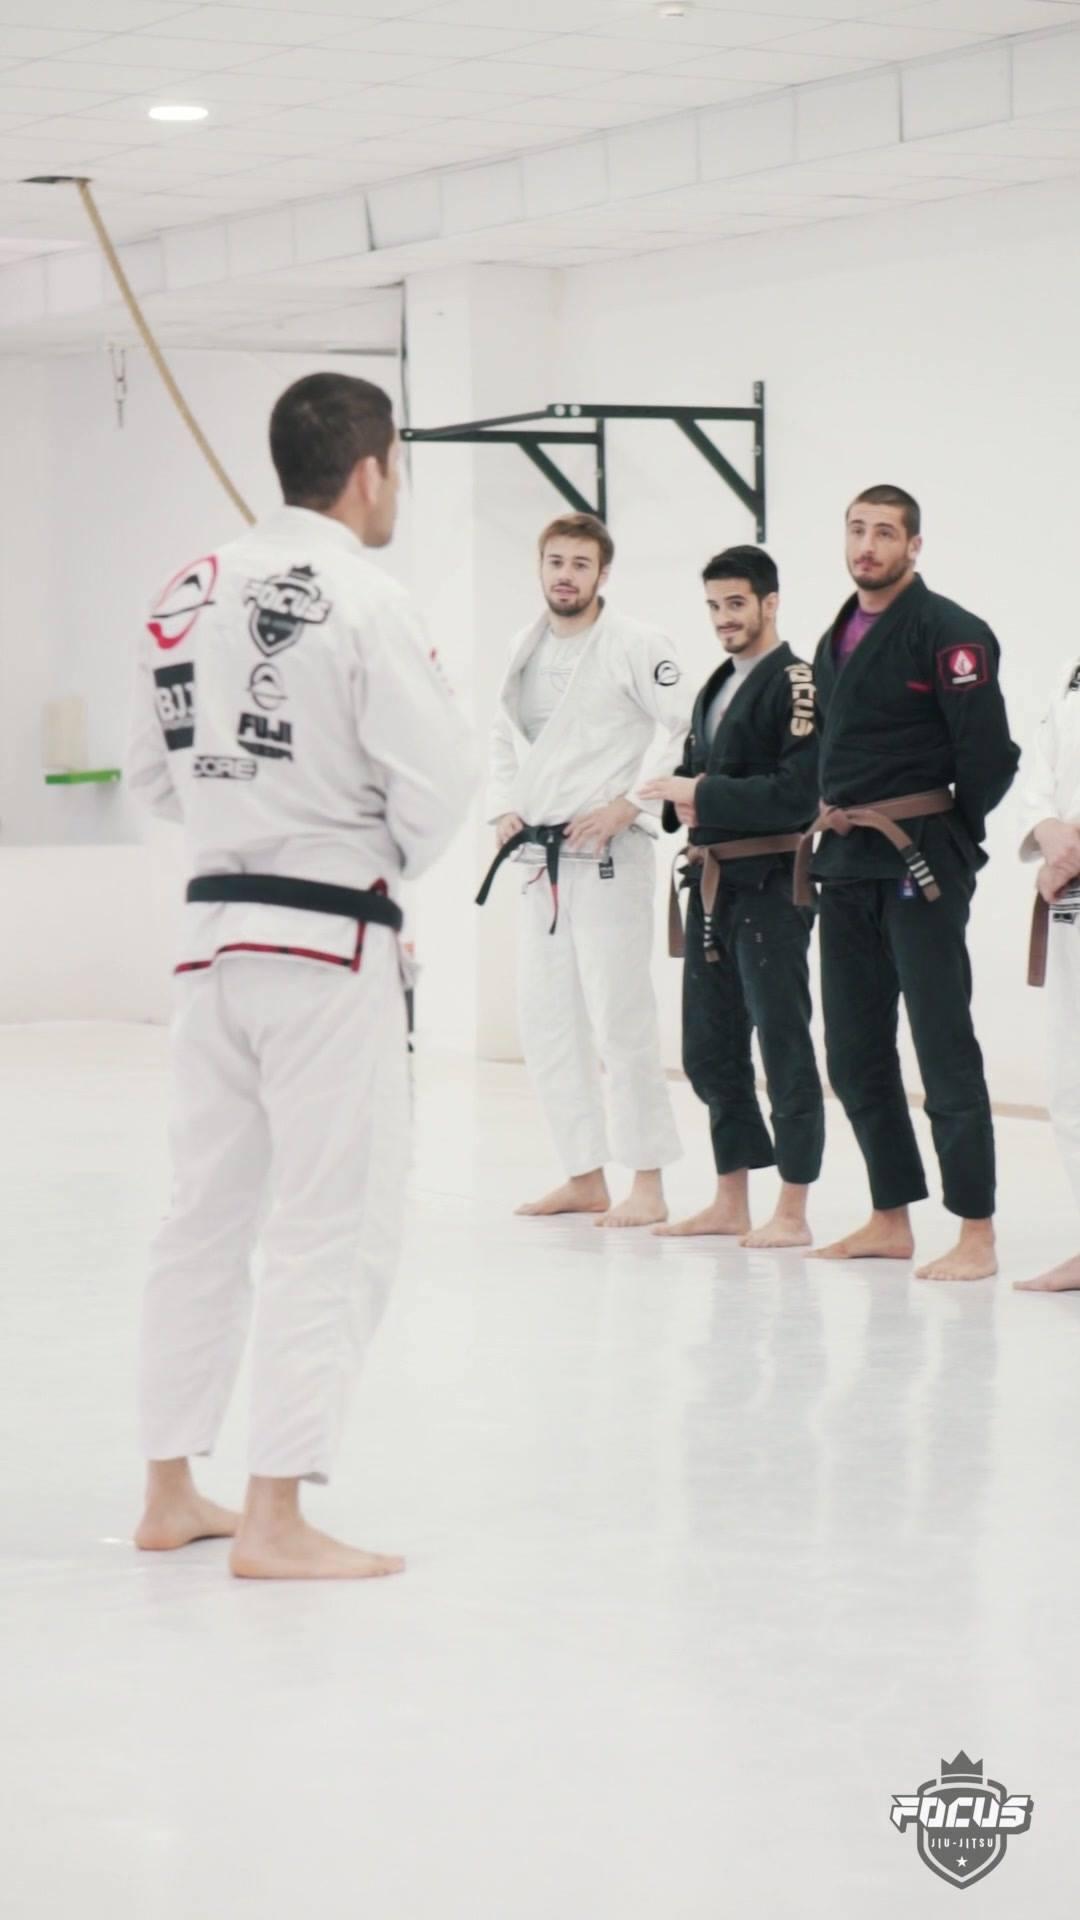 Focus Jiu-Jitsu HQ 🔥